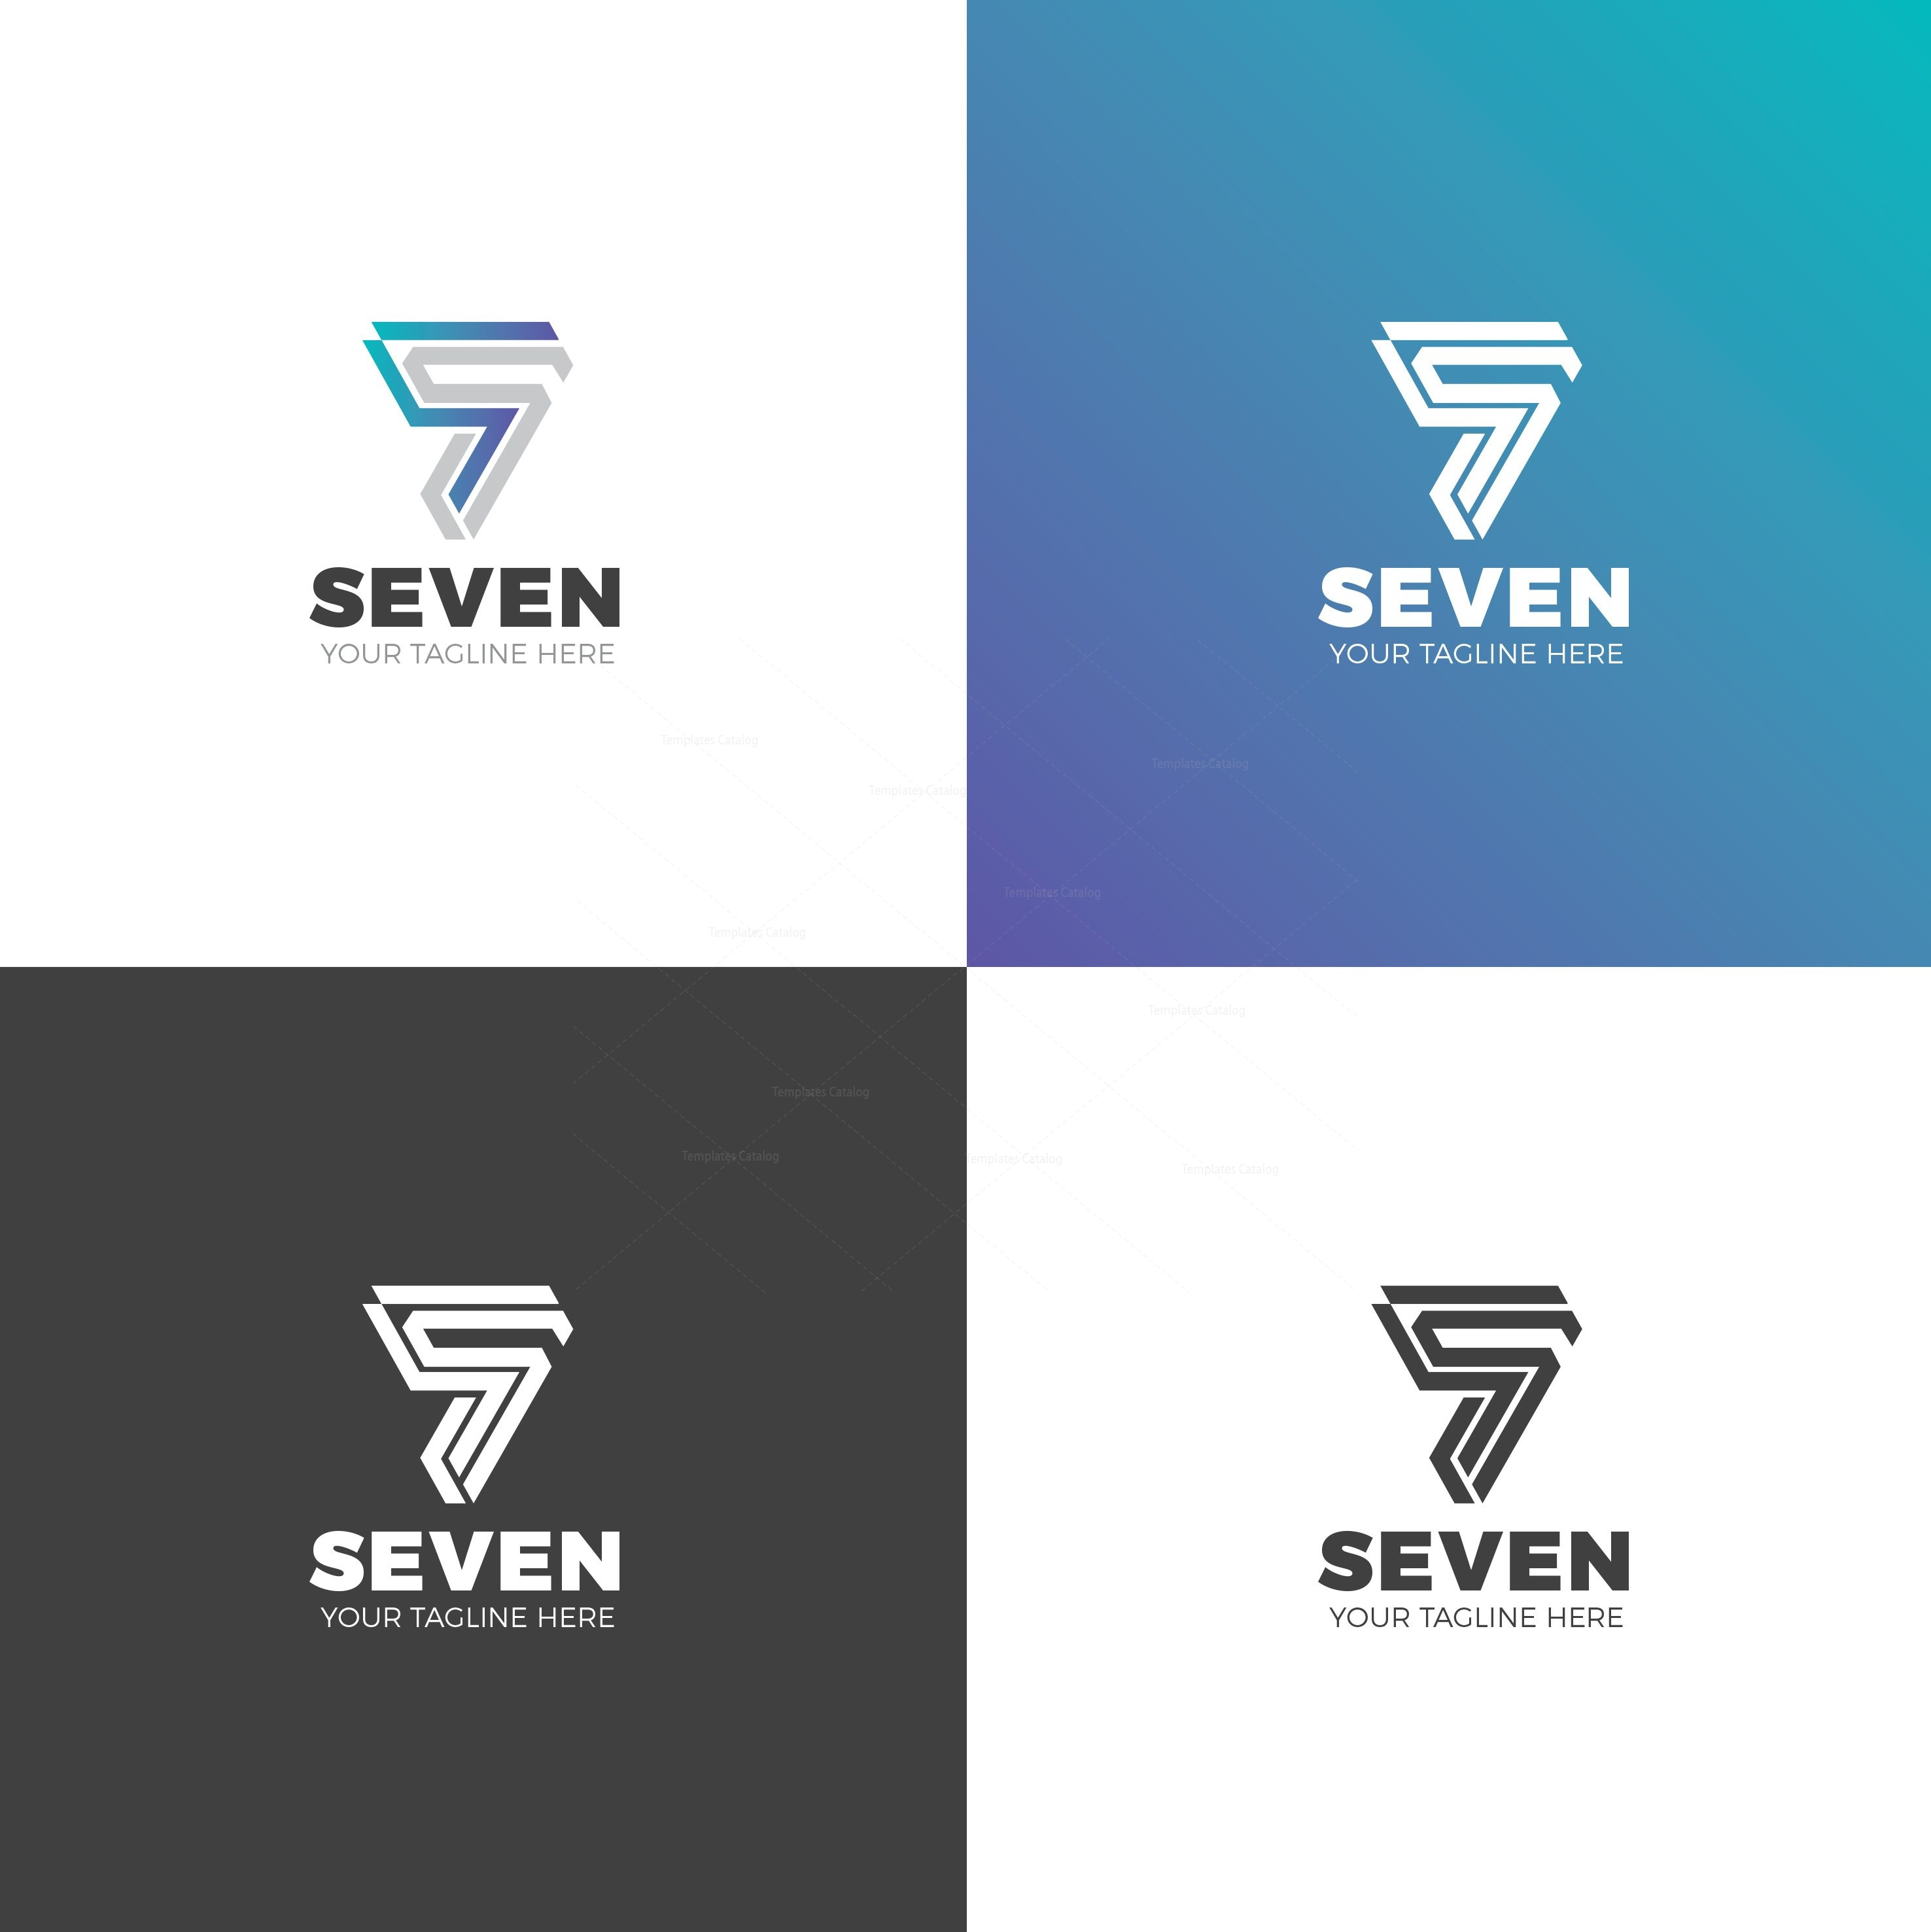 Seven Professional Logo Design Template 001863 - Template ... - photo#38